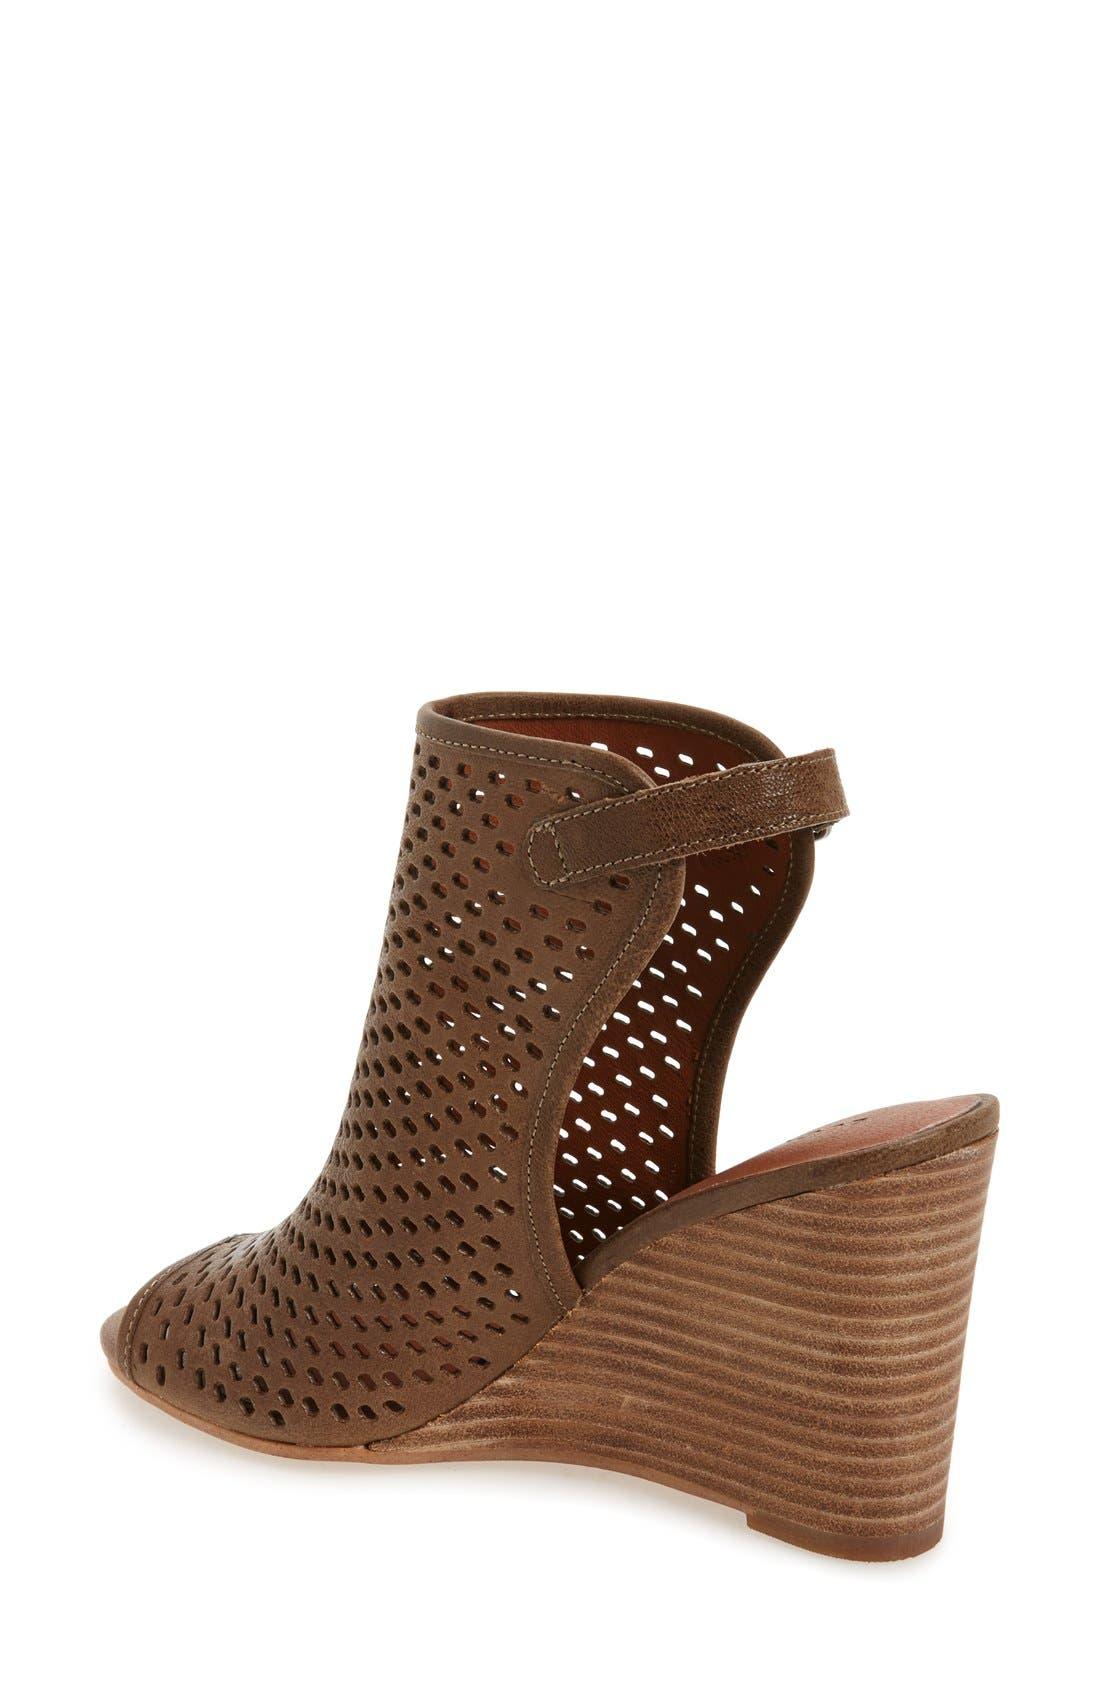 Alternate Image 2  - Lucky Brand 'Rozina' Cutout Wedge Sandal (Women)